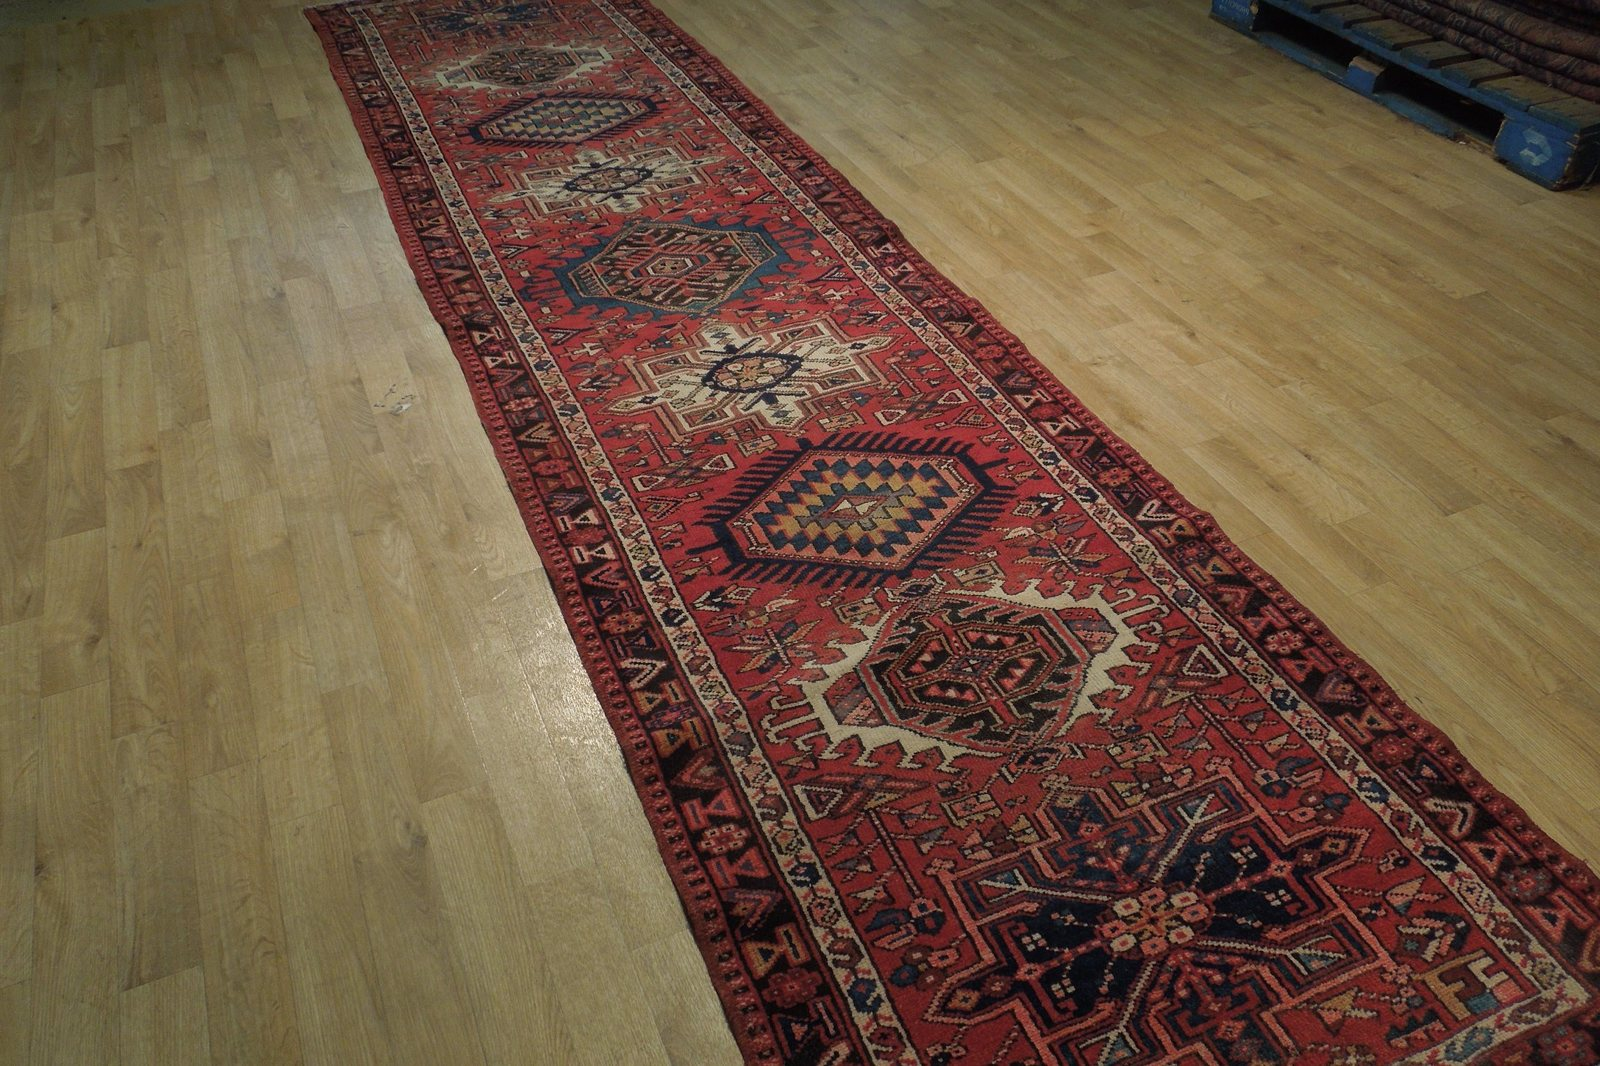 Red 3 x 13 All-Over Classic Tribal Design Runner Karaja Persian Handmade Rug image 2